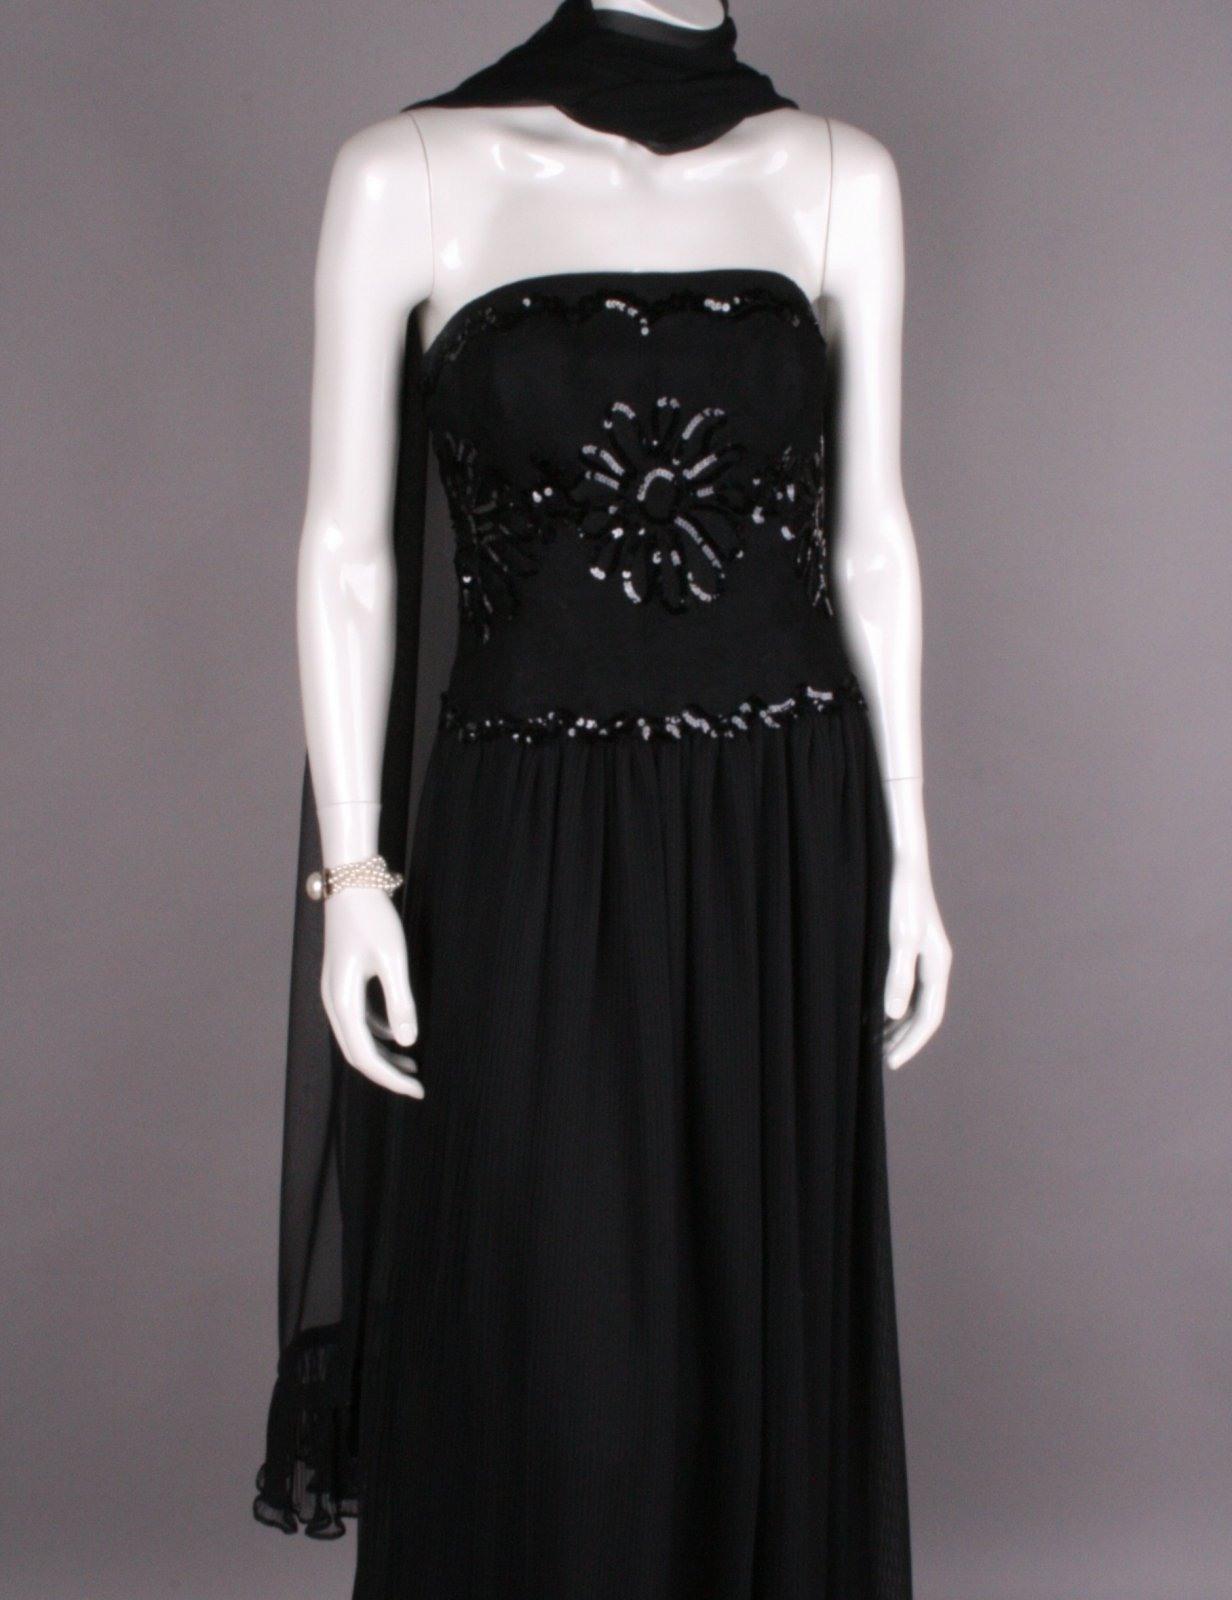 10 Spektakulär Abendkleid 36 Spezialgebiet13 Cool Abendkleid 36 Bester Preis